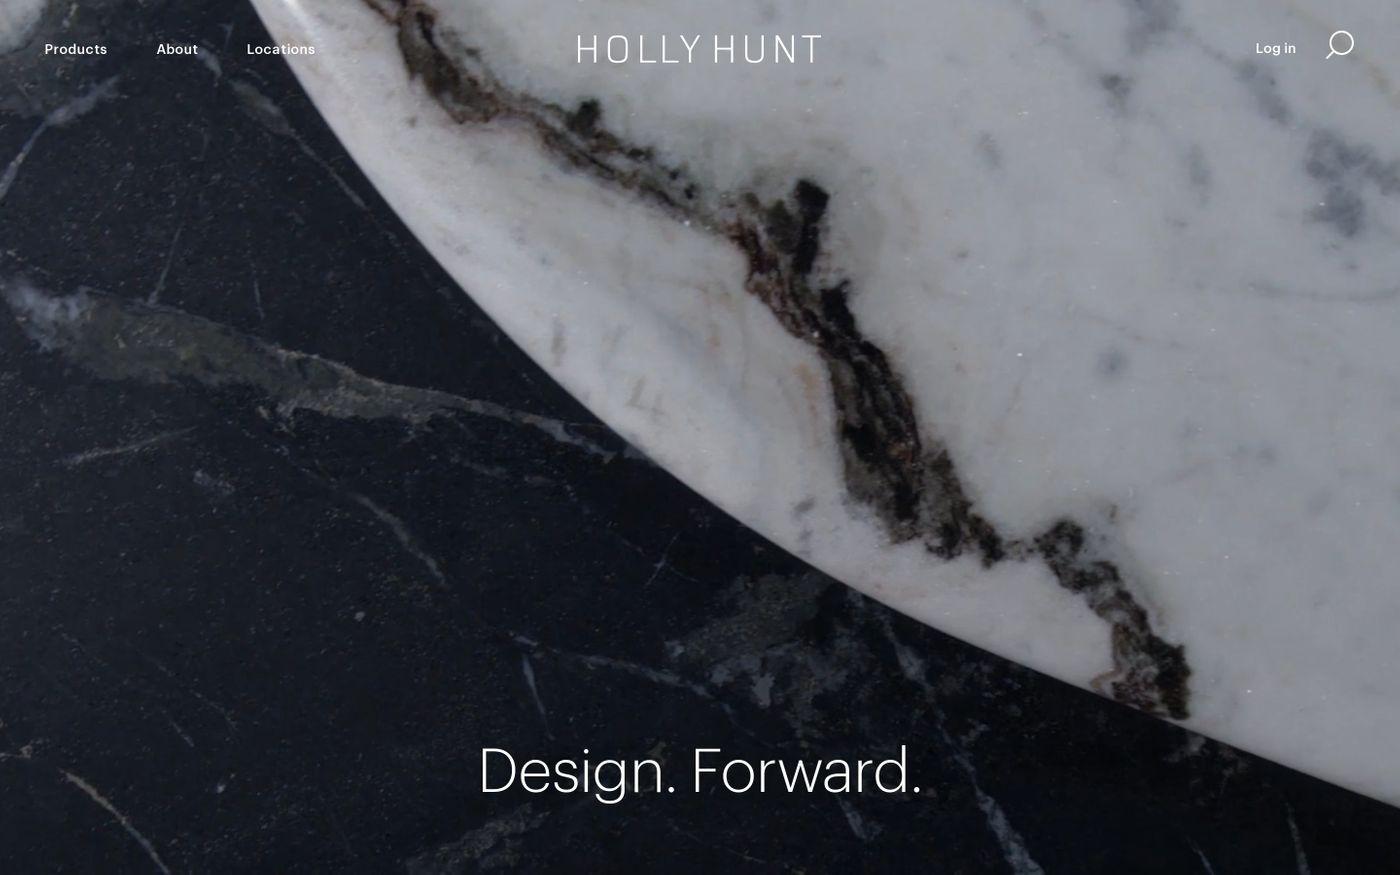 Screenshot of Holly hunt website